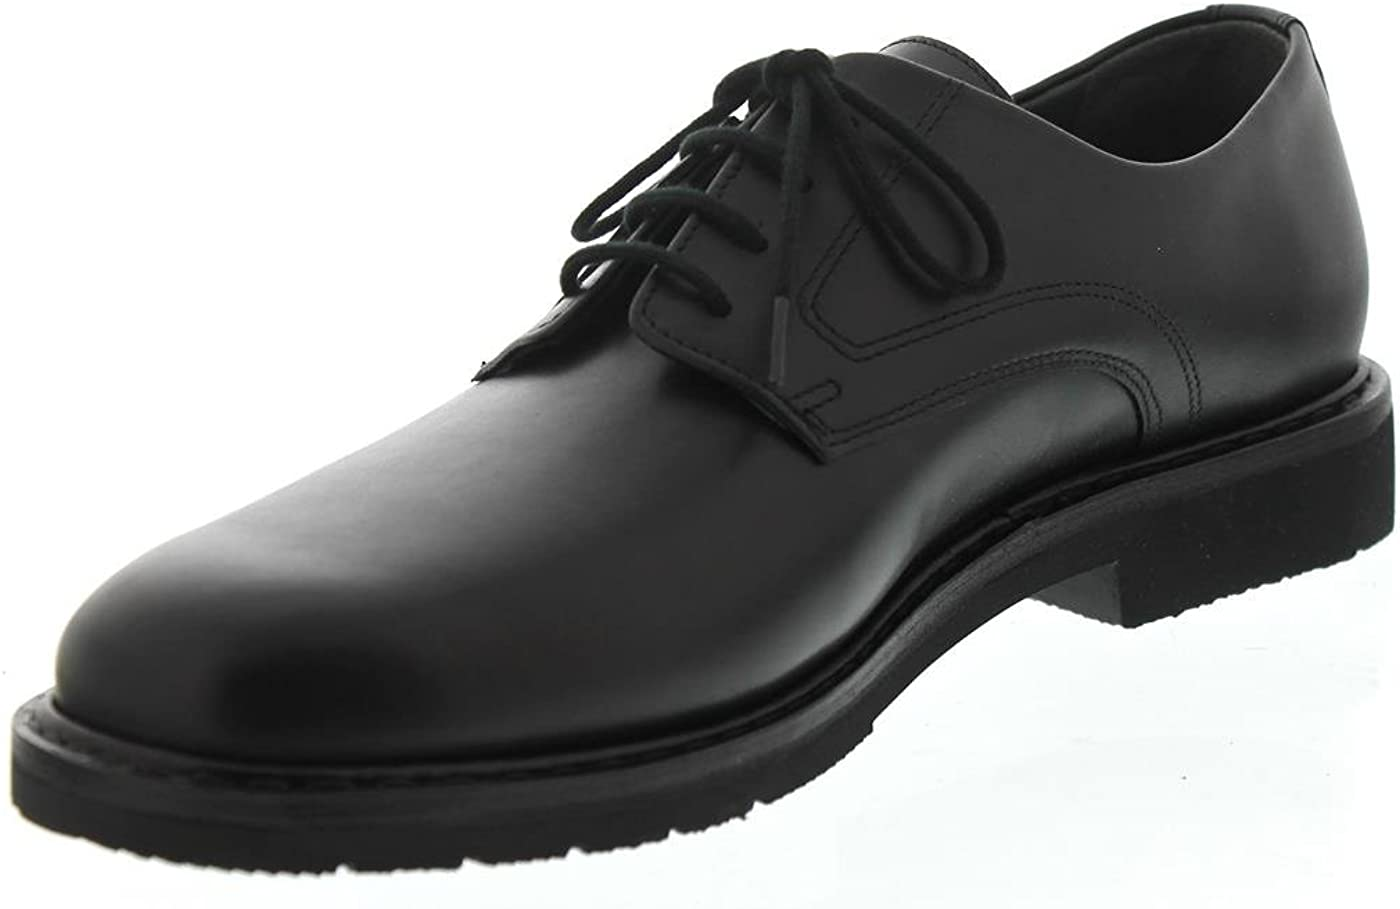 Noir Chaussures MARLON 46-11.5 Mephisto